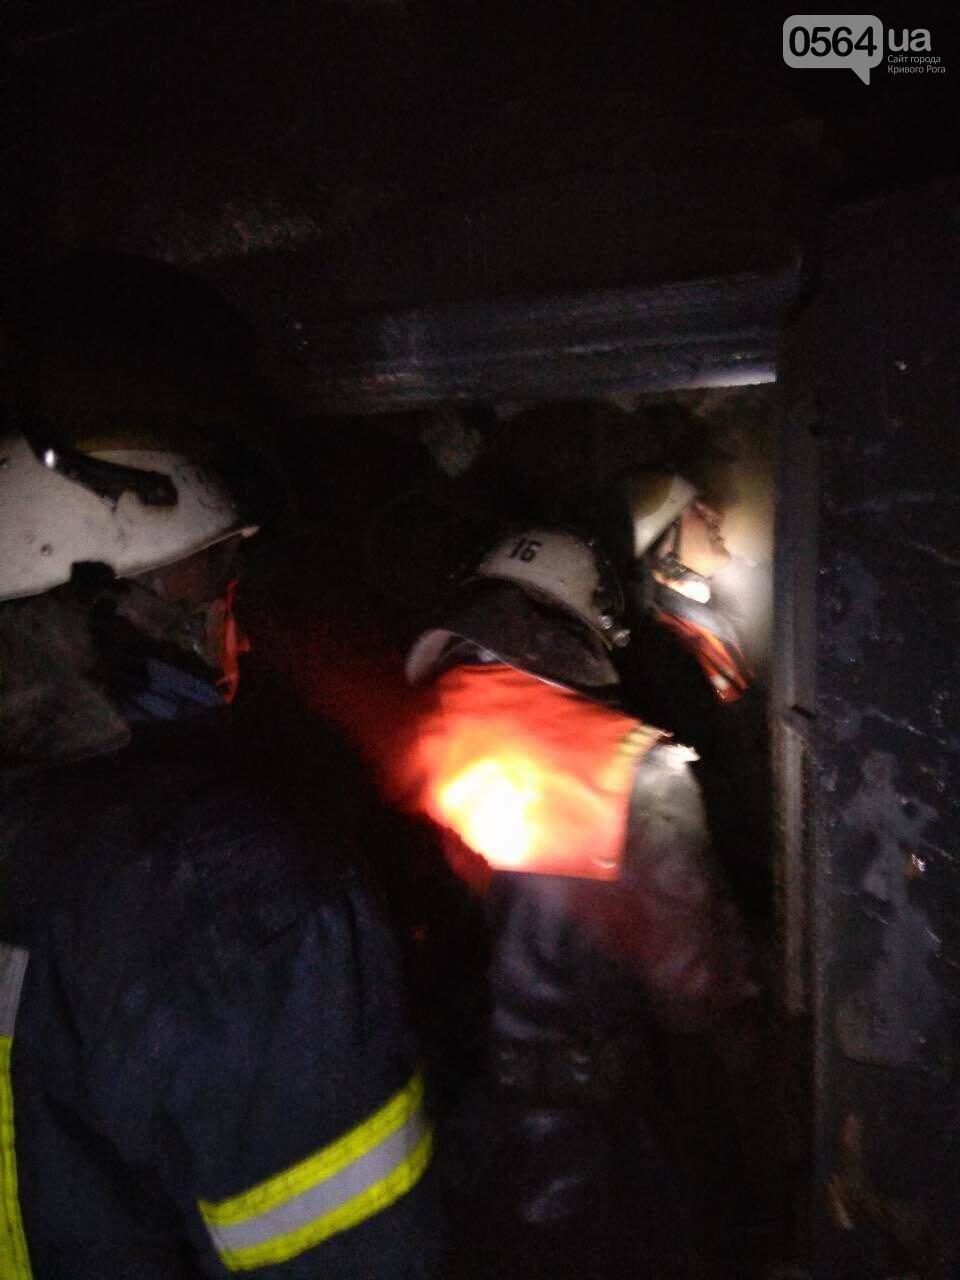 На пожаре в Кривом Роге пострадал пенсионер, - ФОТО , фото-4